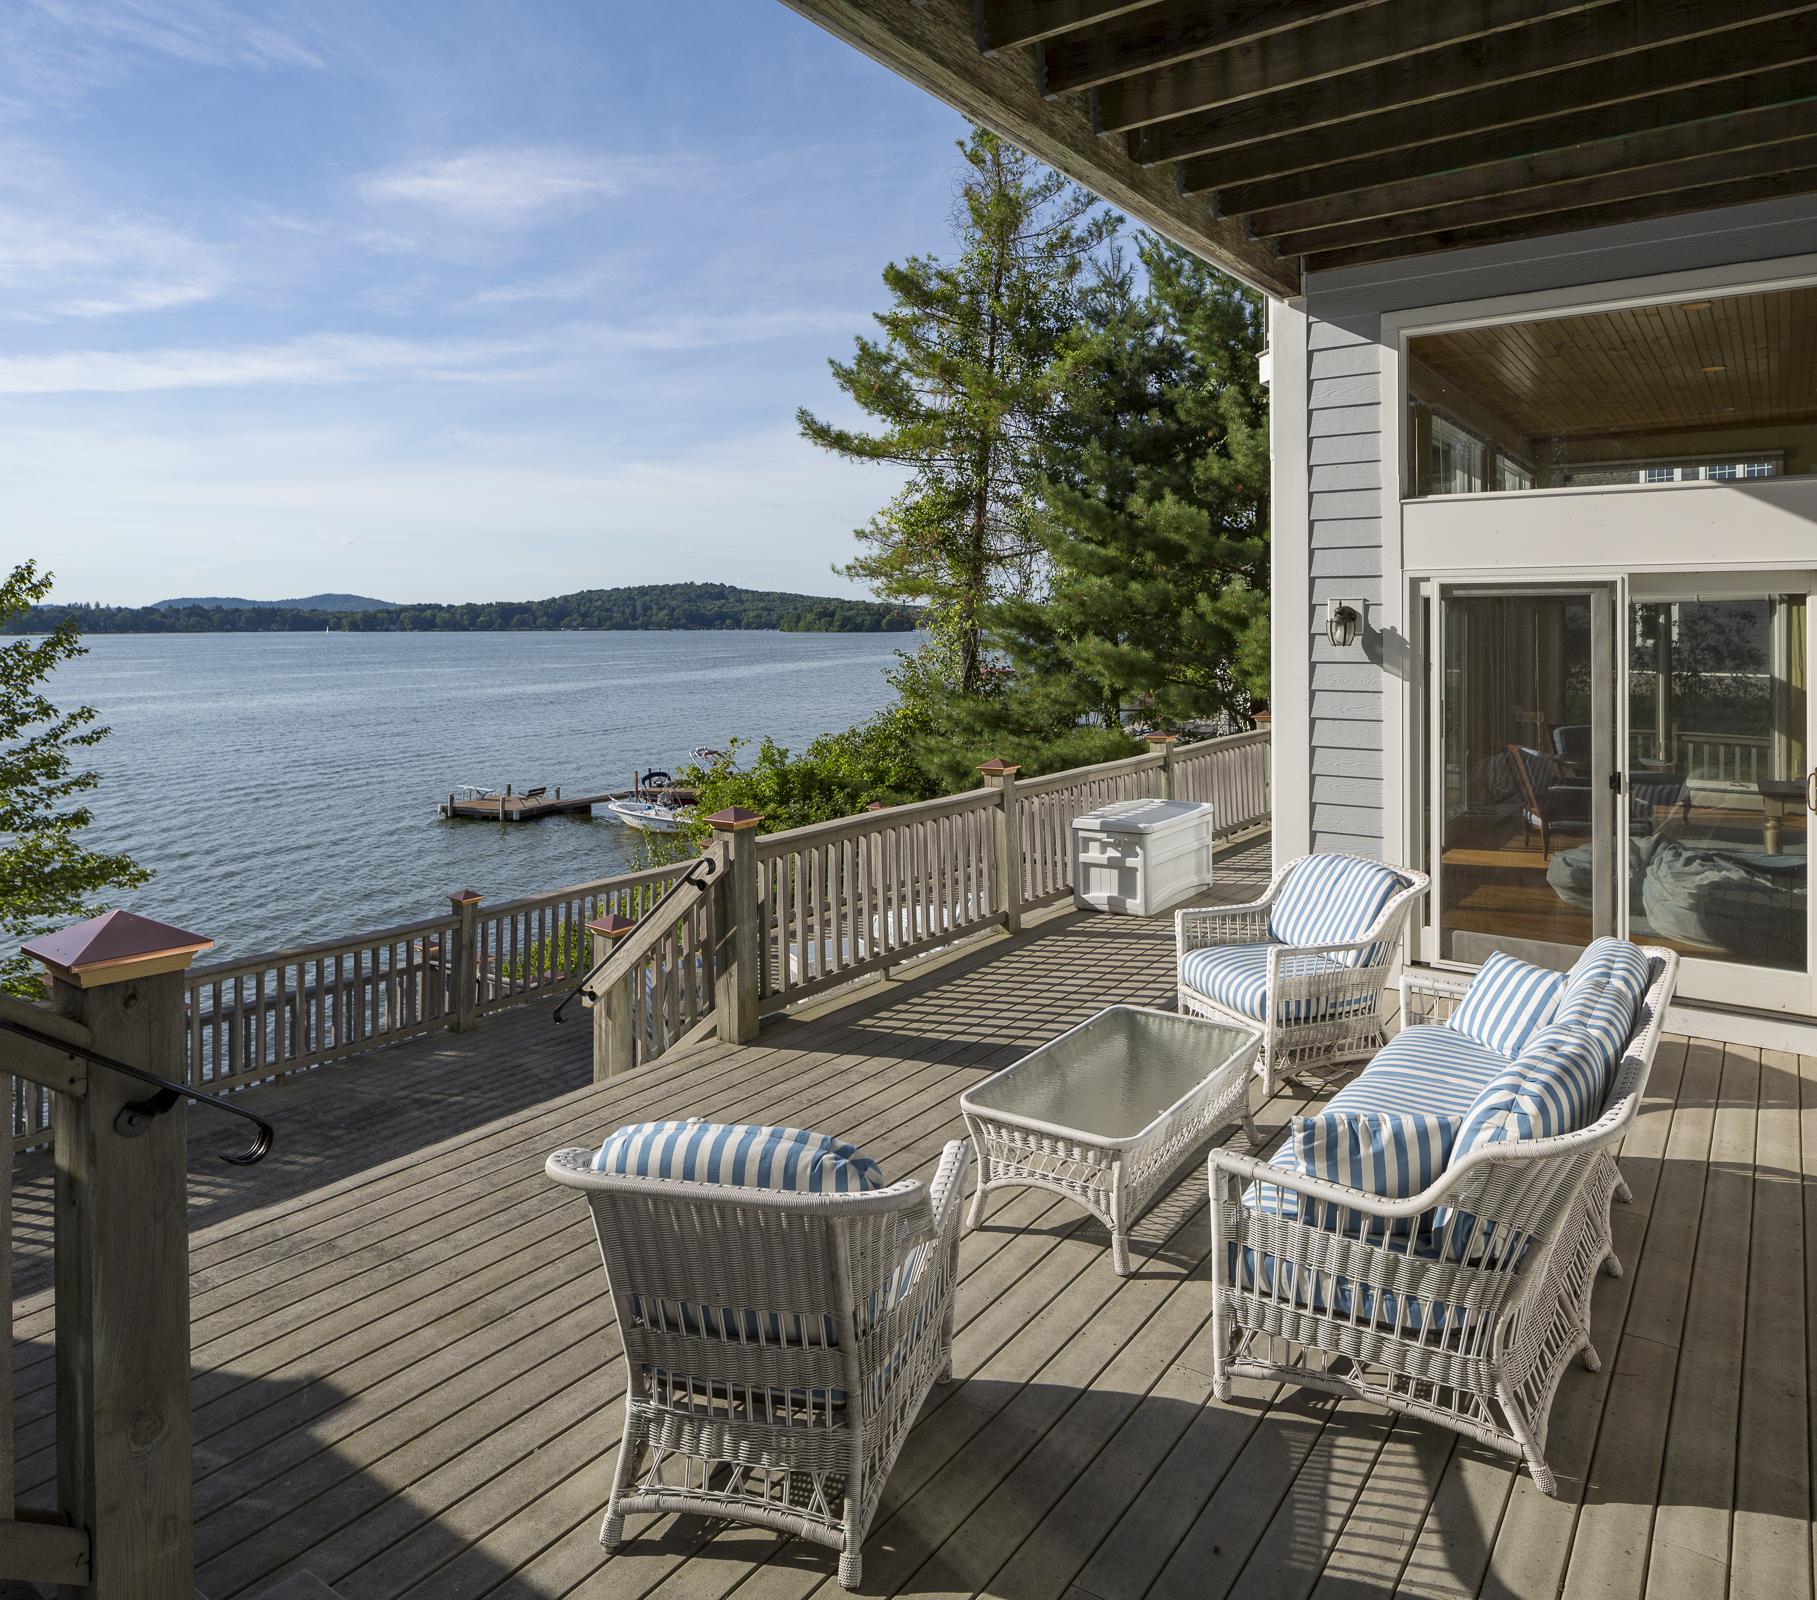 独户住宅 为 销售 在 Bantam Lake Waterfront Home 259 East Shore Drive 莫里斯, 康涅狄格州, 06763 美国